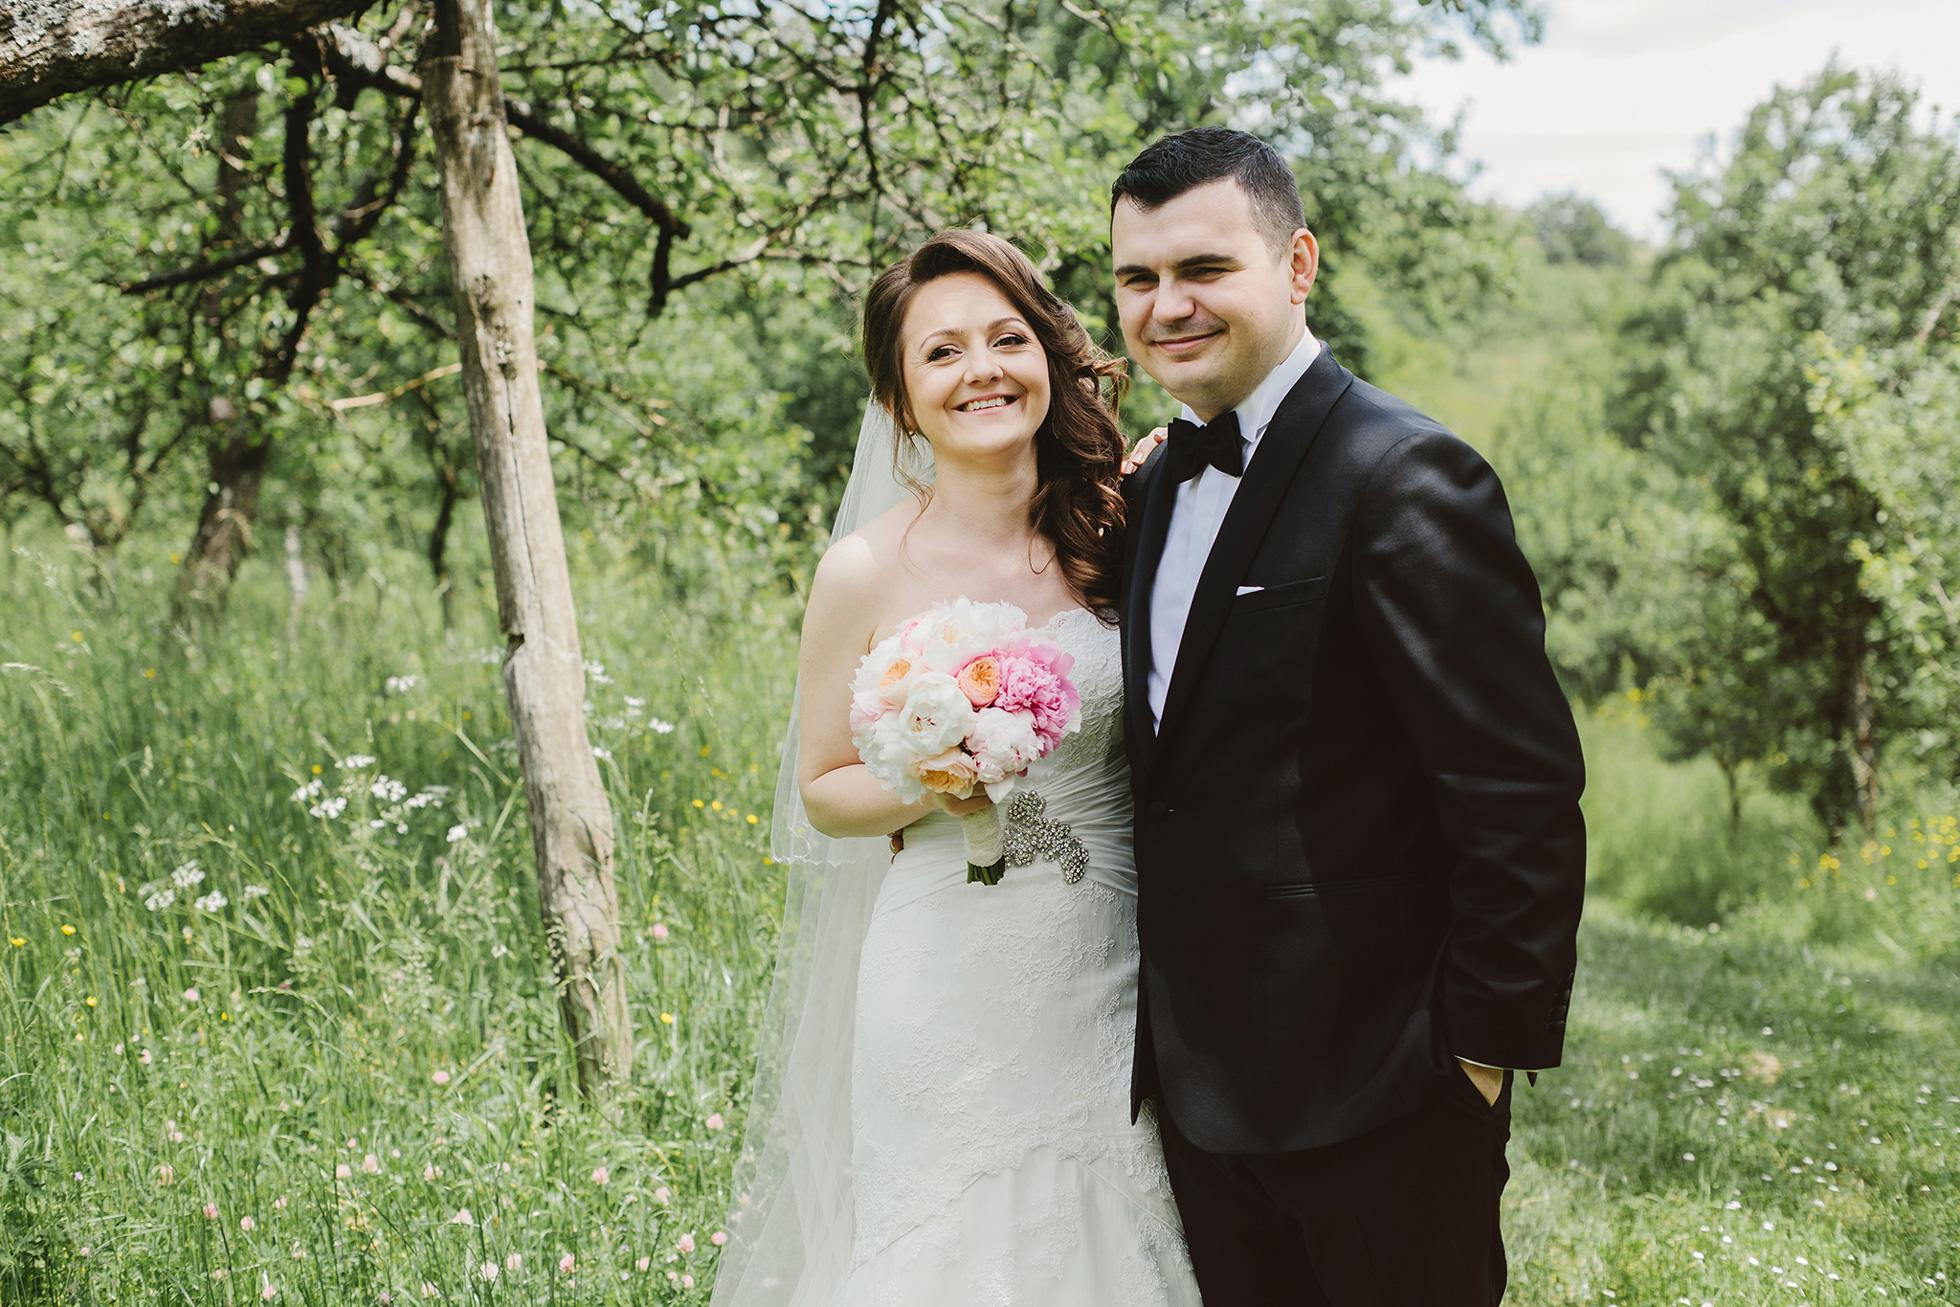 Liana-+-Florin-{wedding}-100